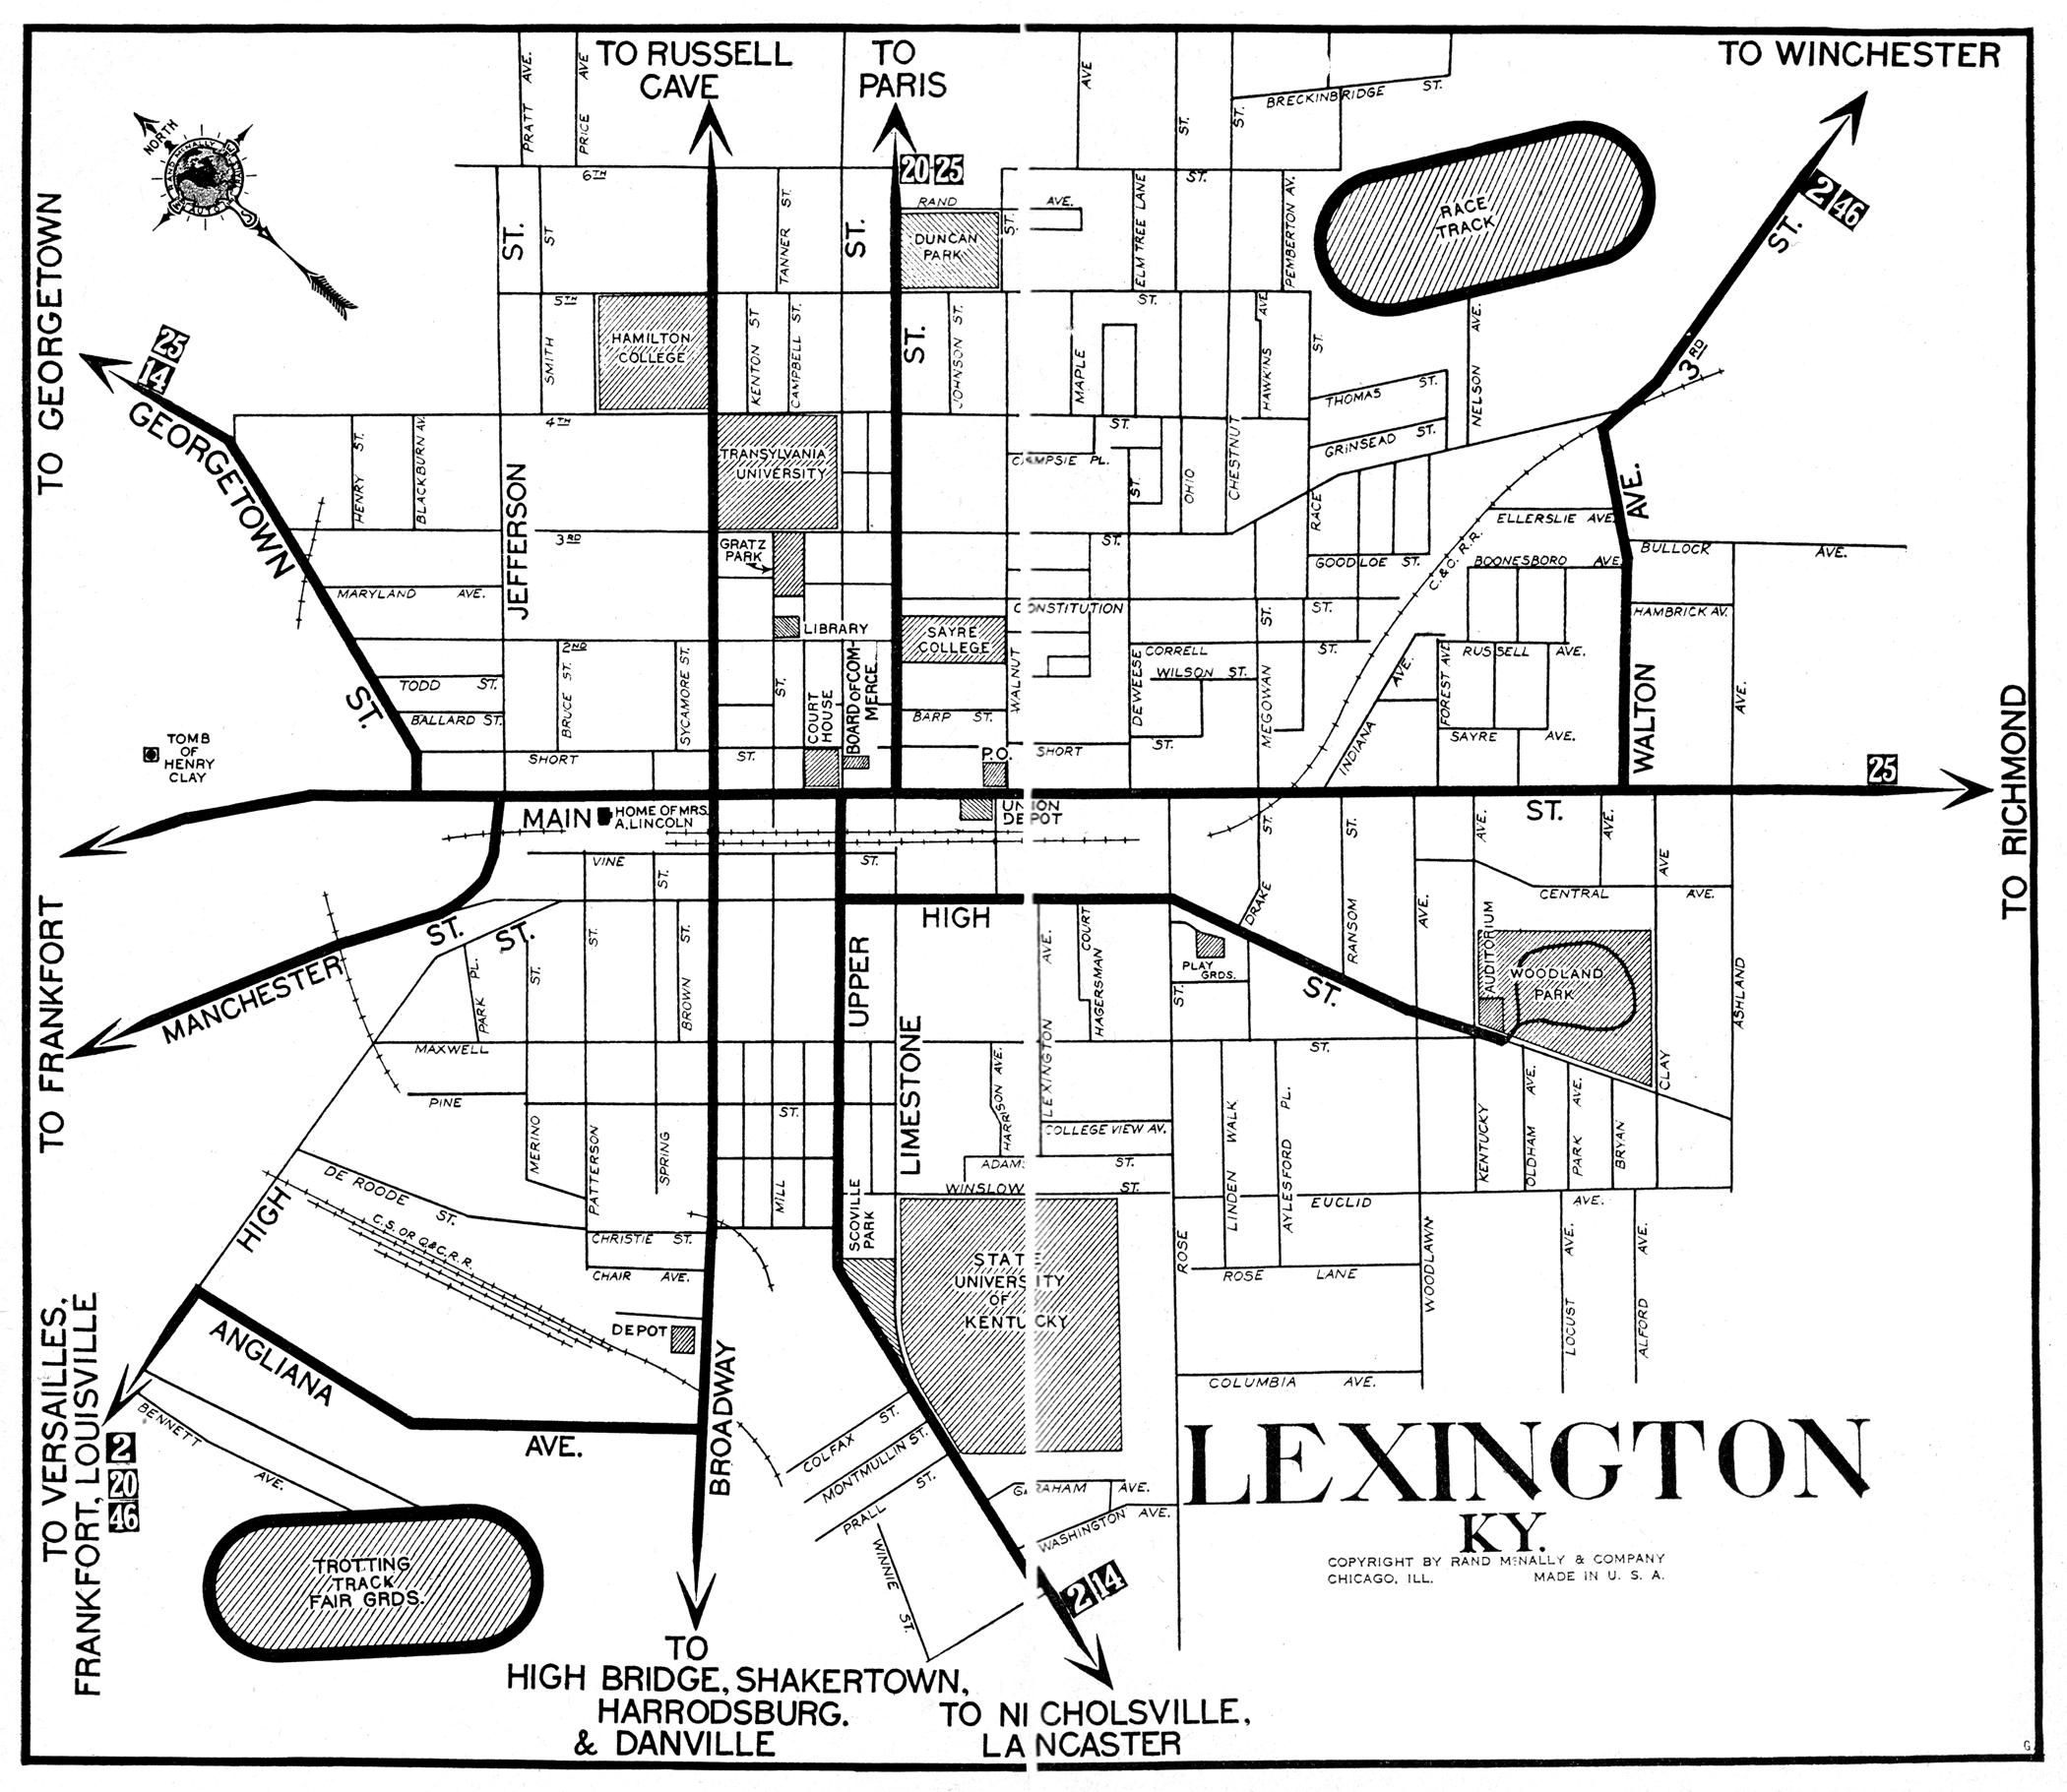 Kentucky City Maps At AmericanRoadscom - Kentucky city map